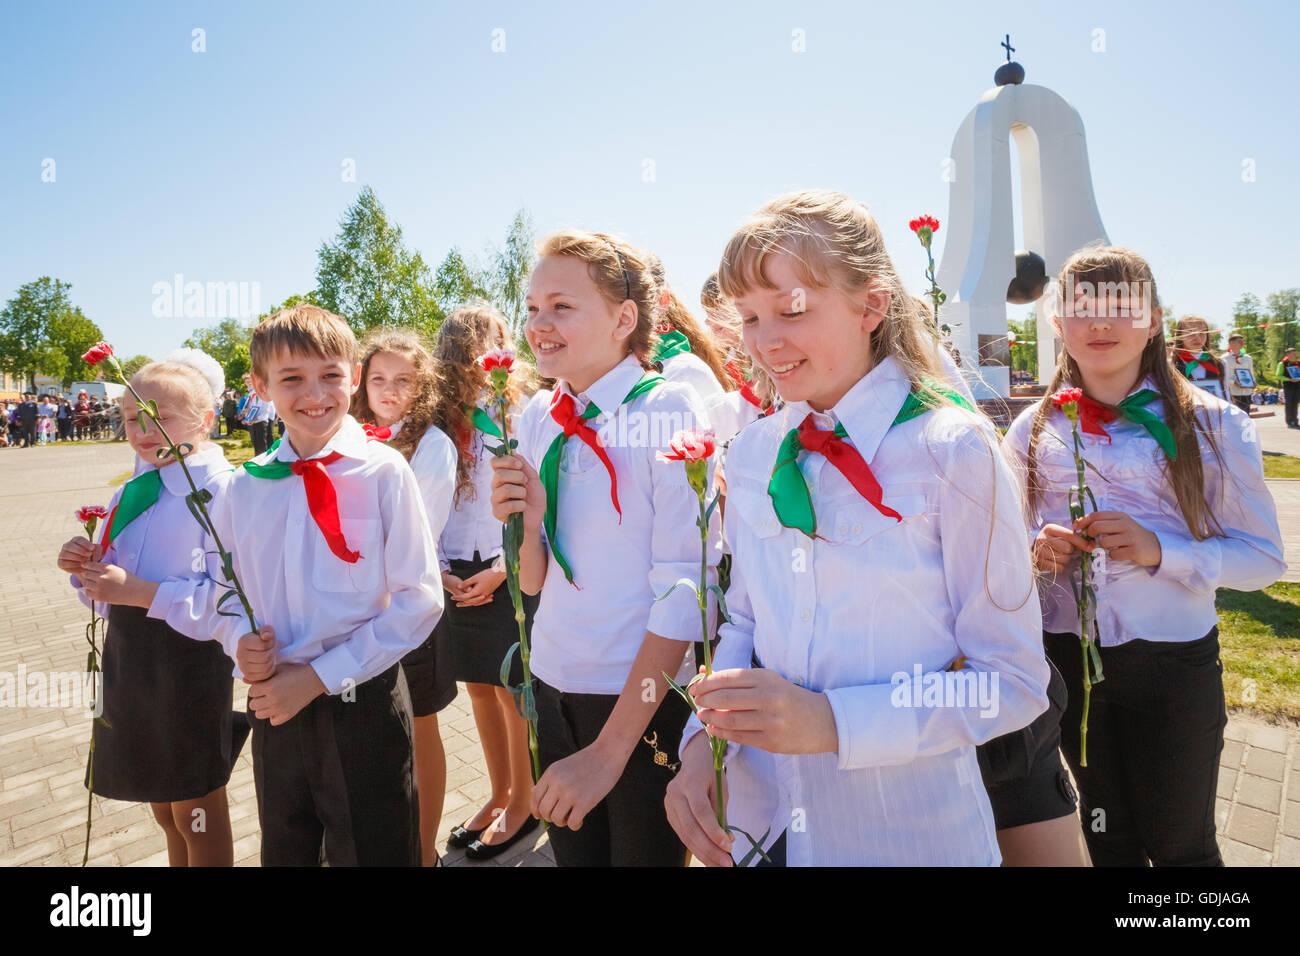 Dobrush (Gomel region), BELARUS - MAY 9, 2014: Reaction of the Unidentified Belarusian schoolchildren to sounds - Stock Image